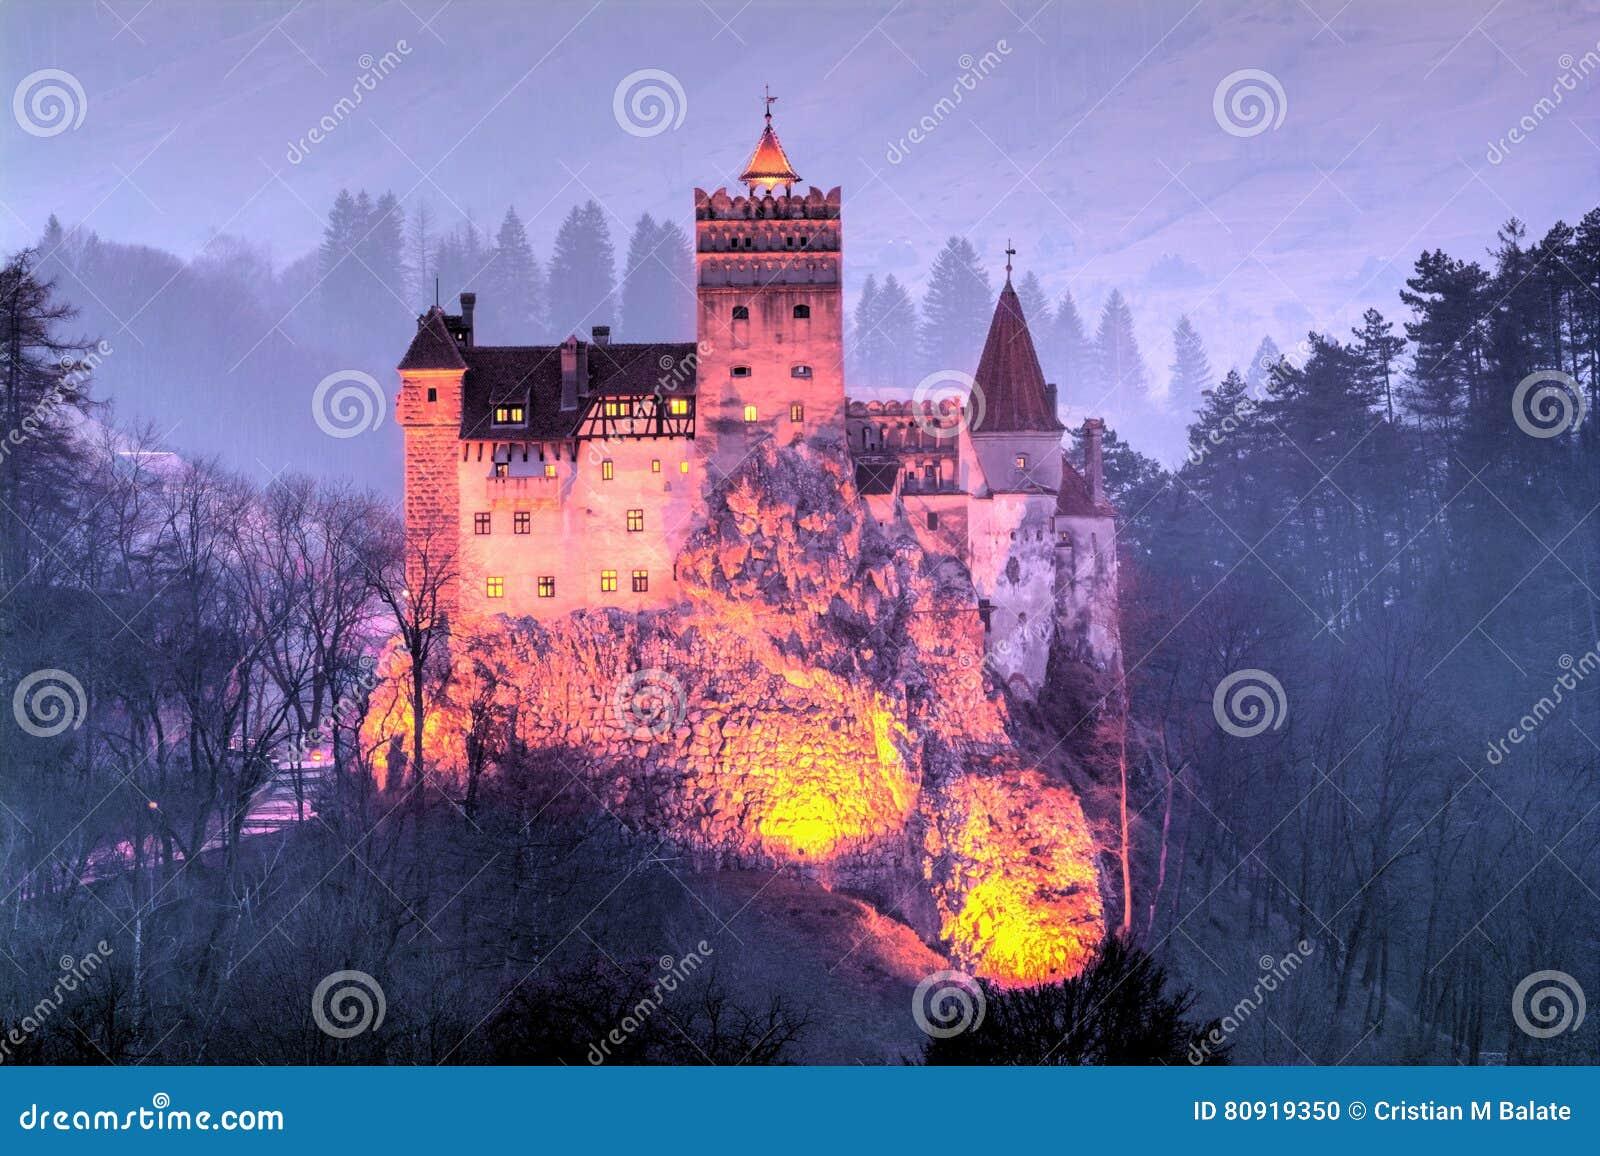 Bran town, castle of Dracula